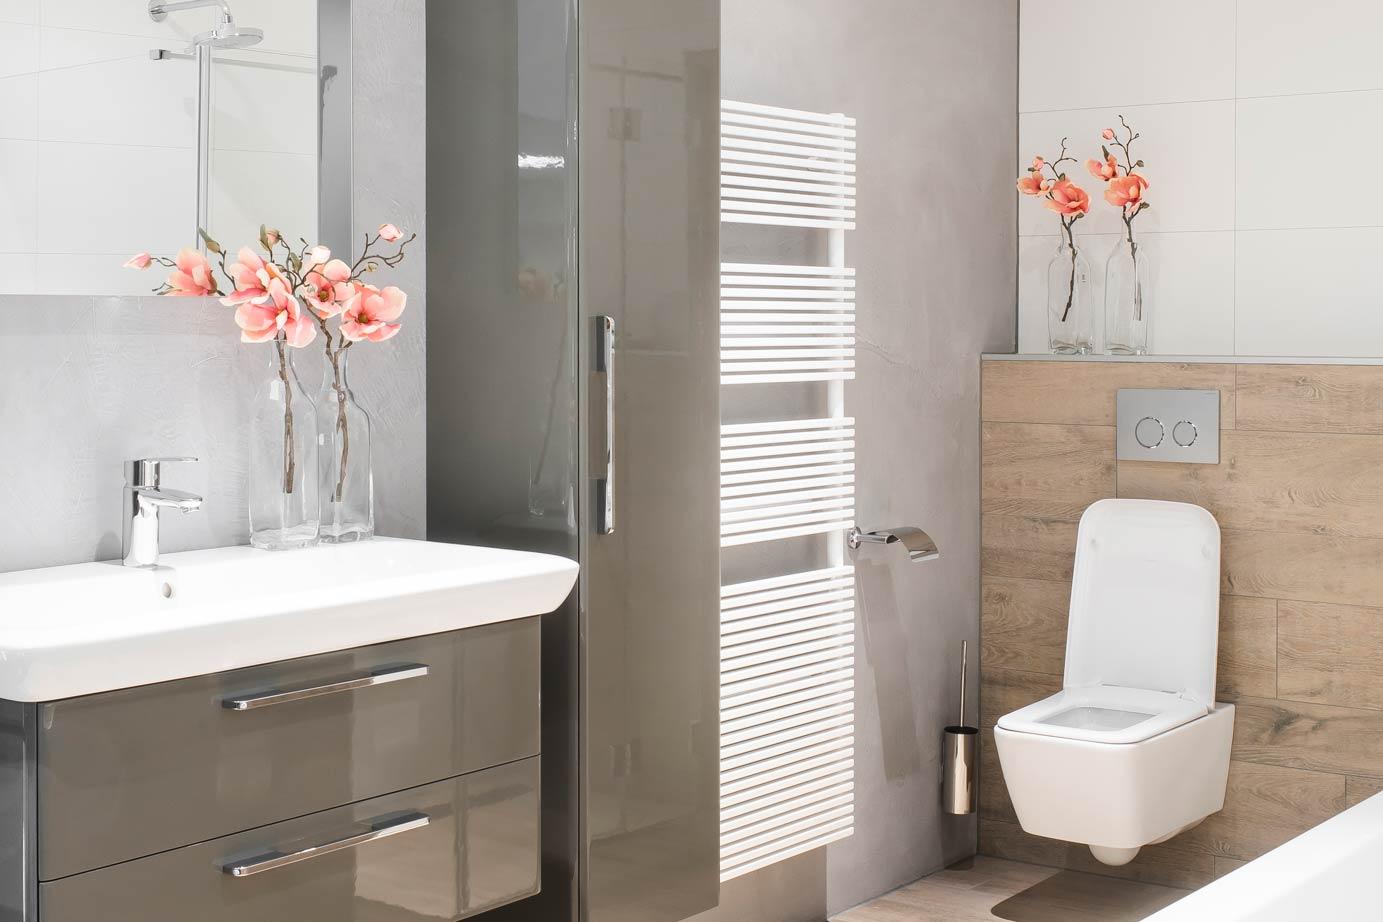 Badkamer Sanitair Maurik : Badkamer kopen ruime keus vele stijlen en lage prijzen db keukens